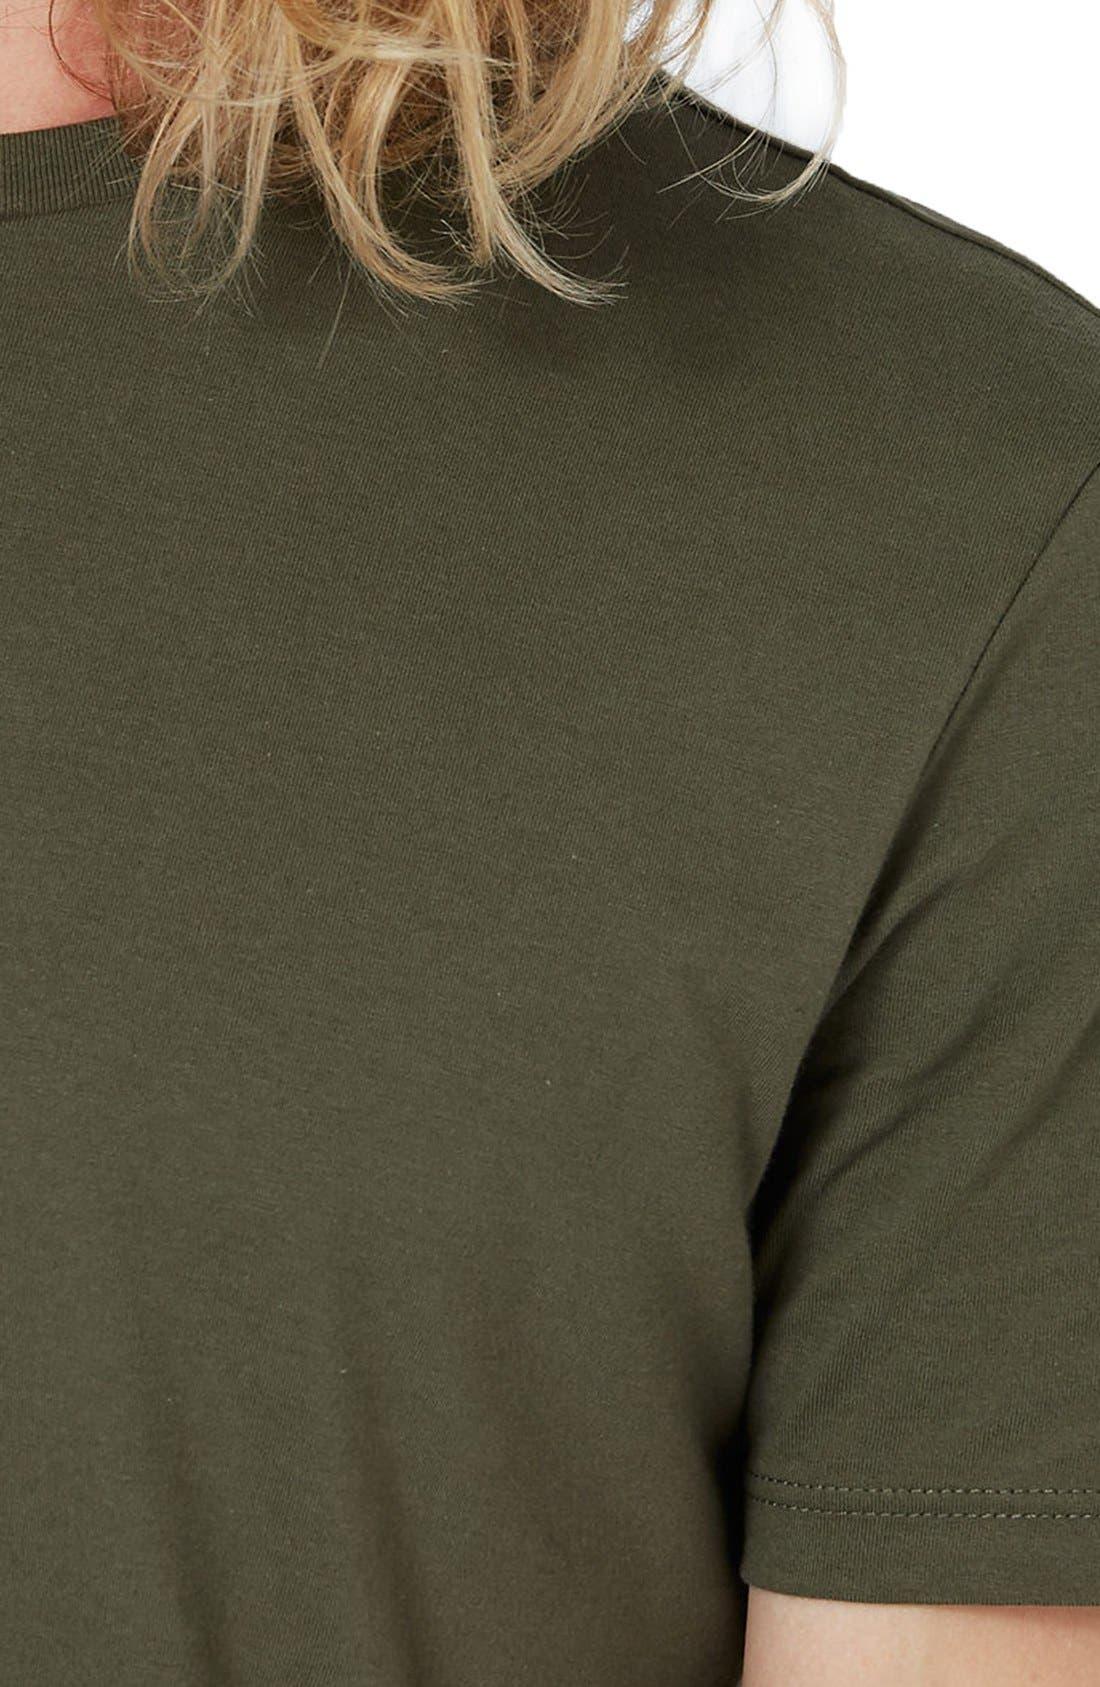 Slim Fit Crewneck T-Shirt,                             Alternate thumbnail 402, color,